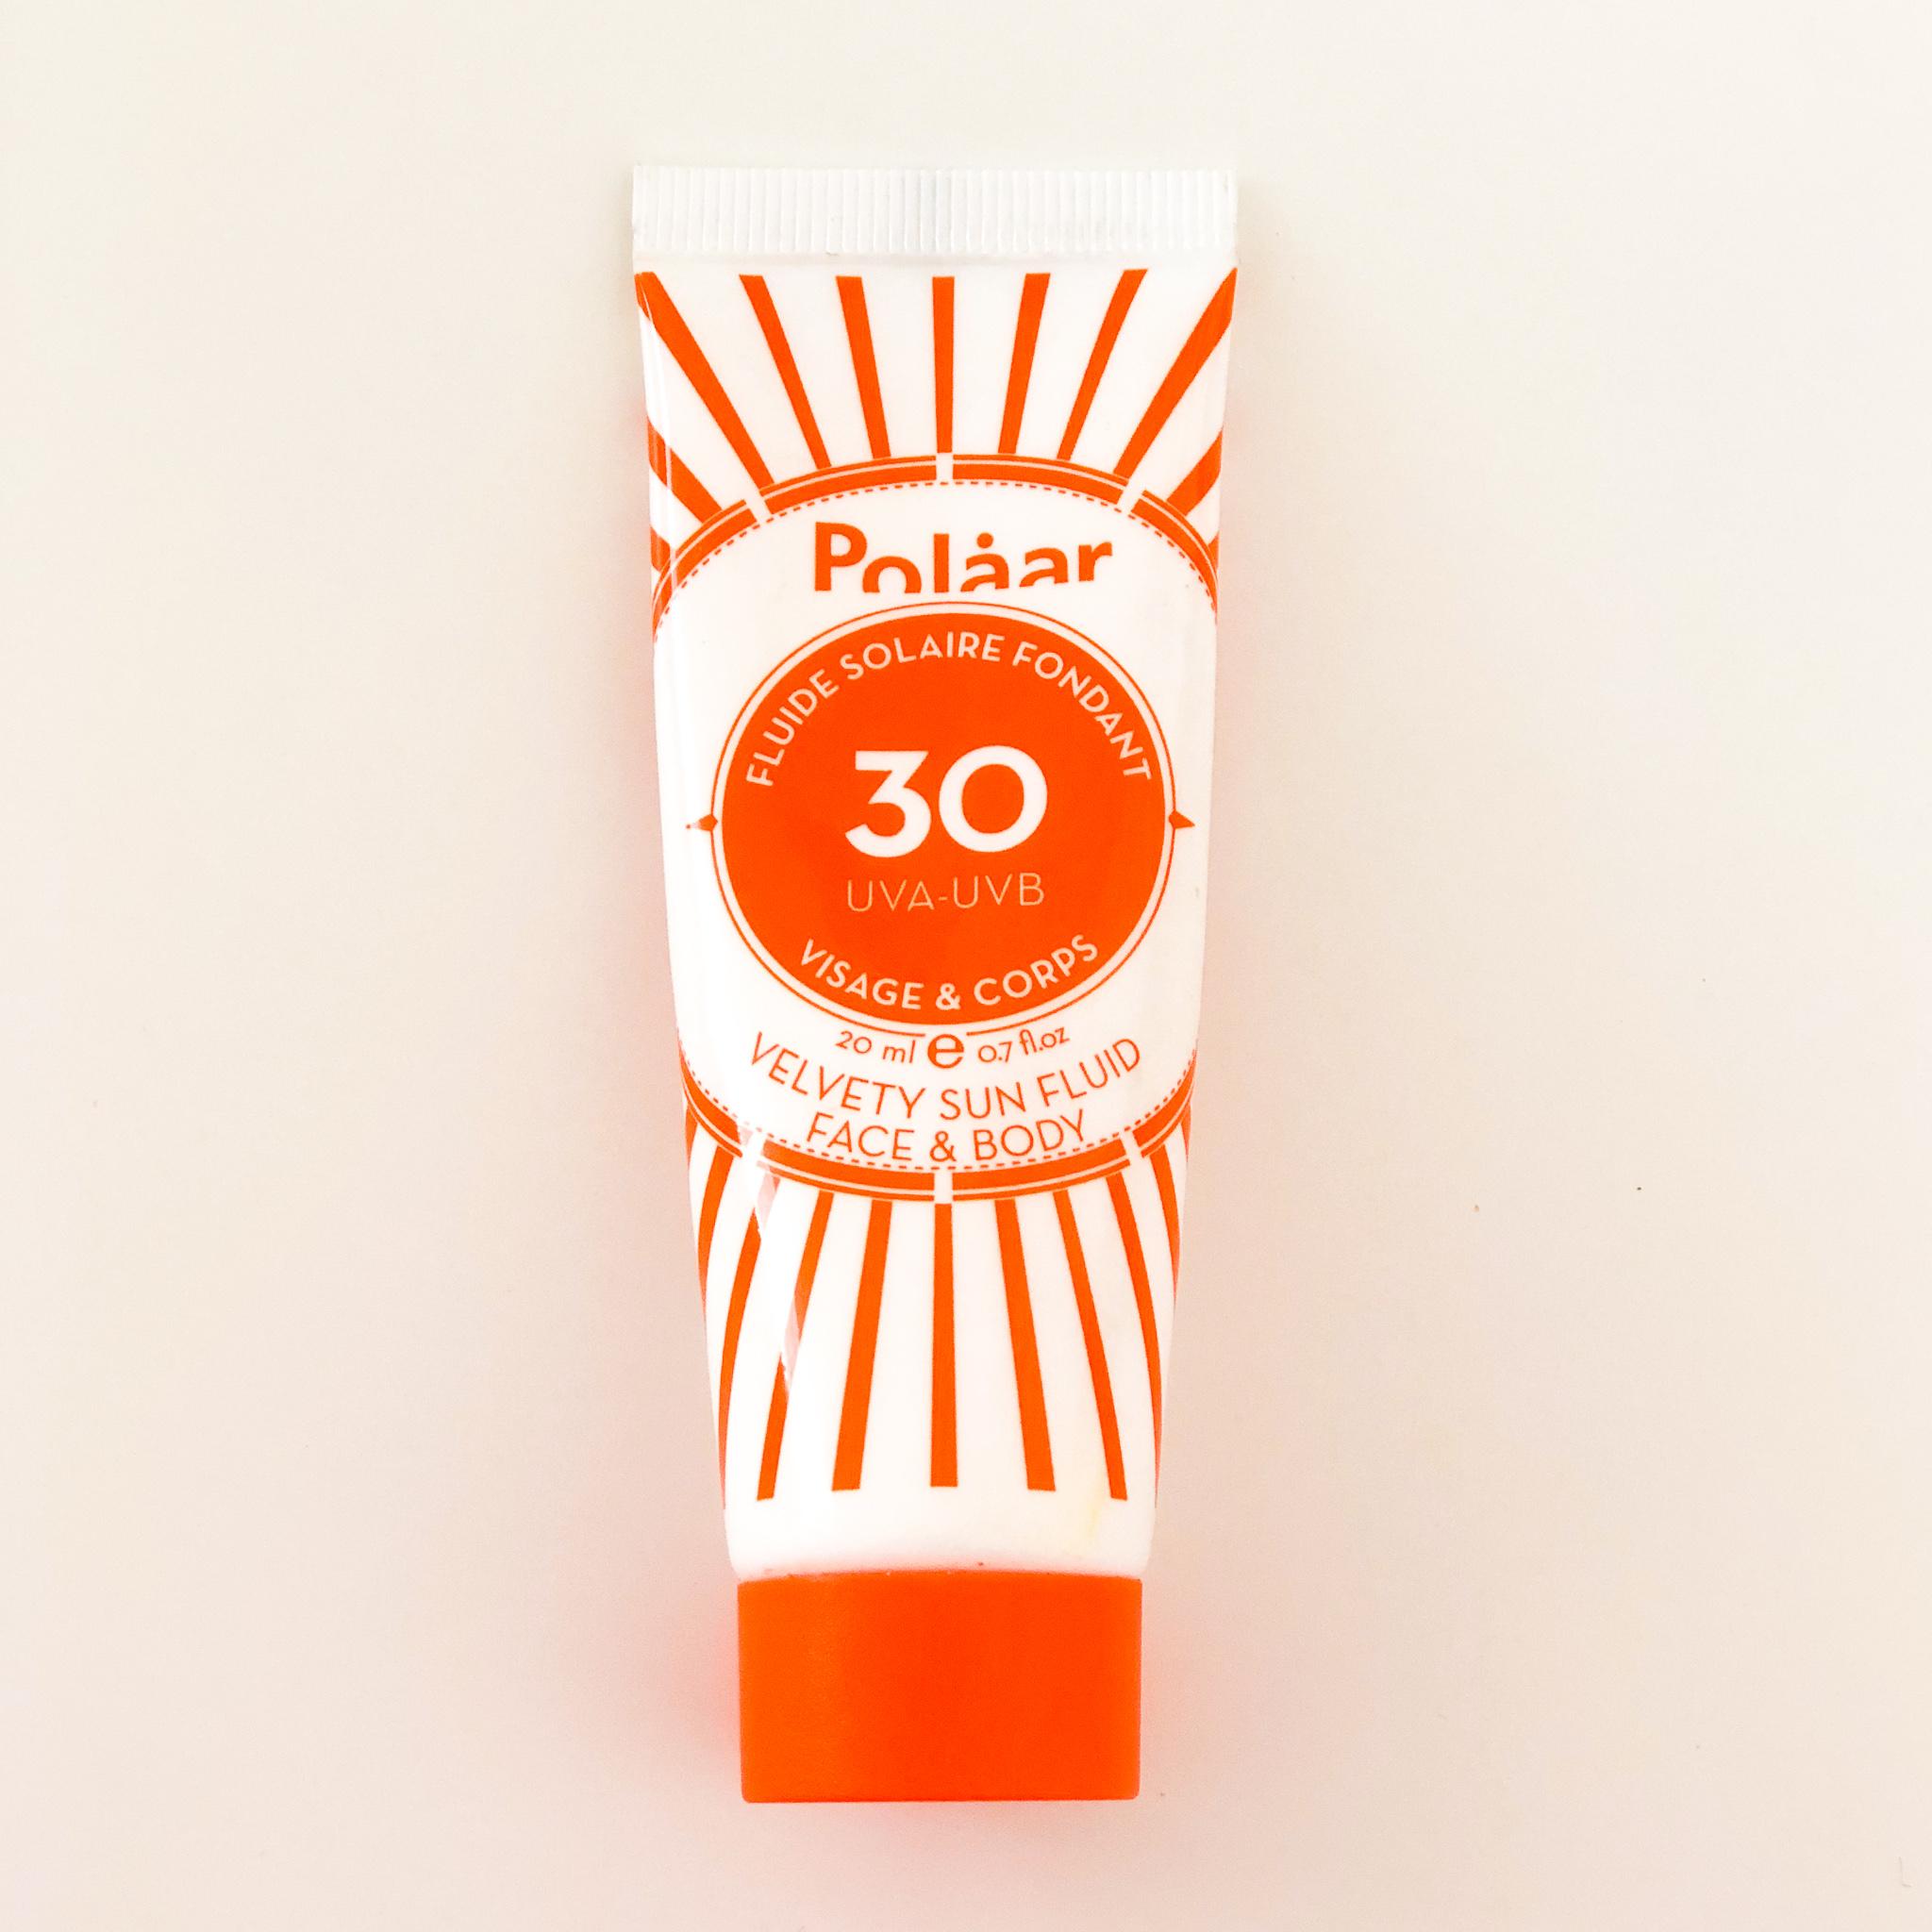 Polaar Sunscreen